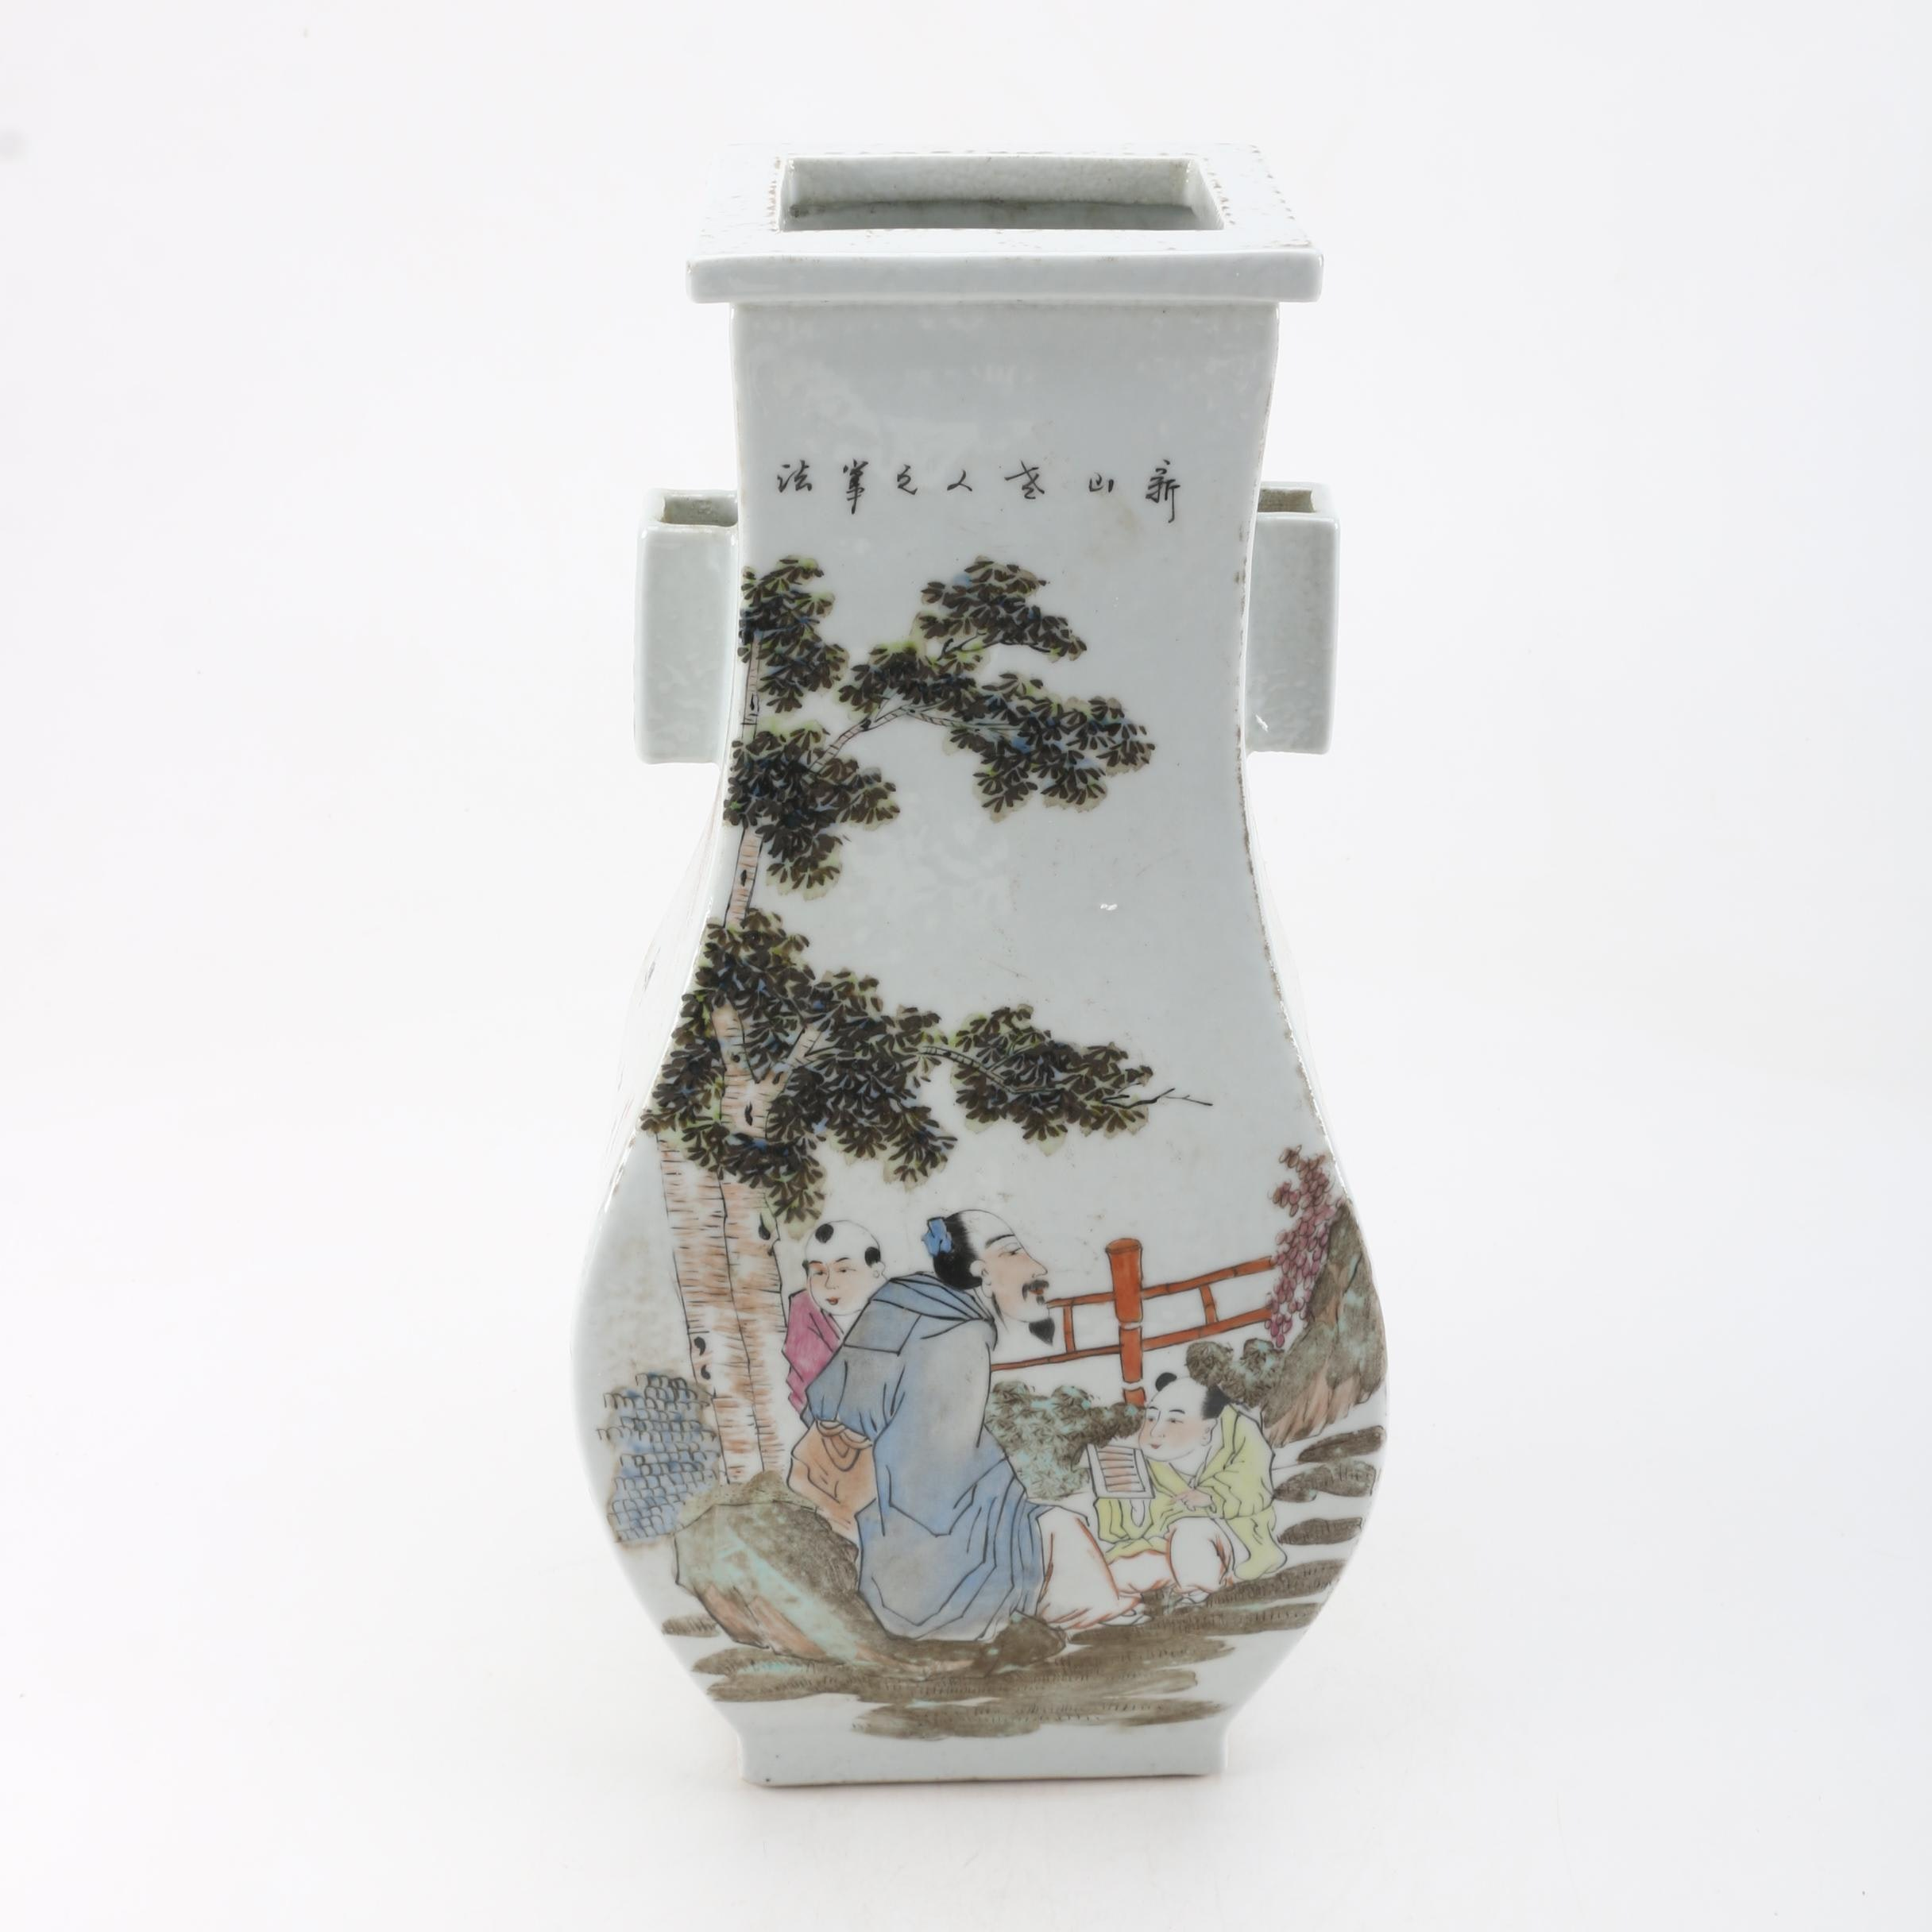 Chinese Painted Ceramic Vase